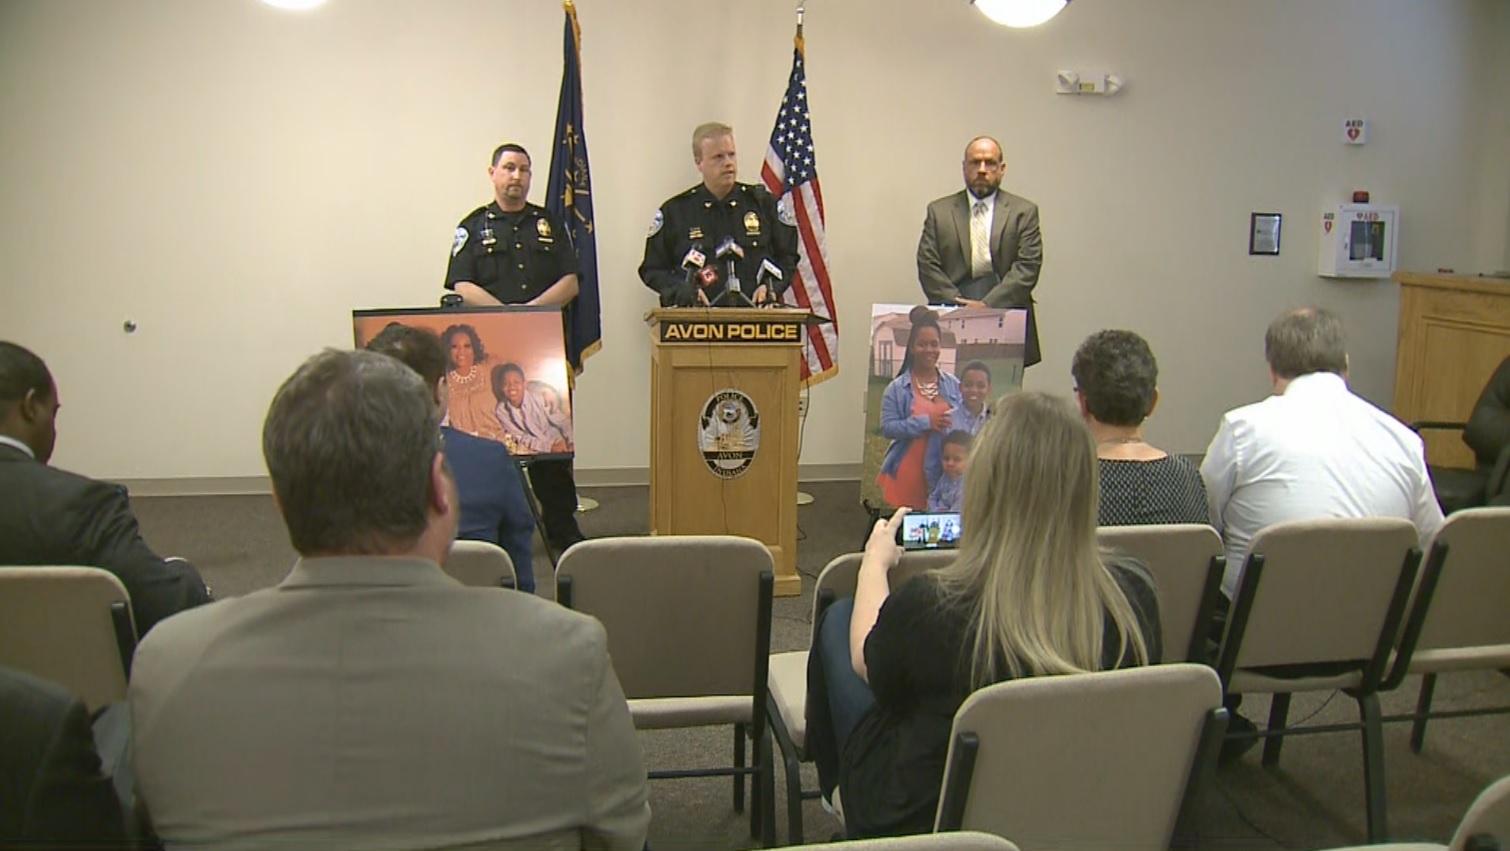 Avon police discuss Najah Ferrell case_1554918642998.jpg-873774424.jpg